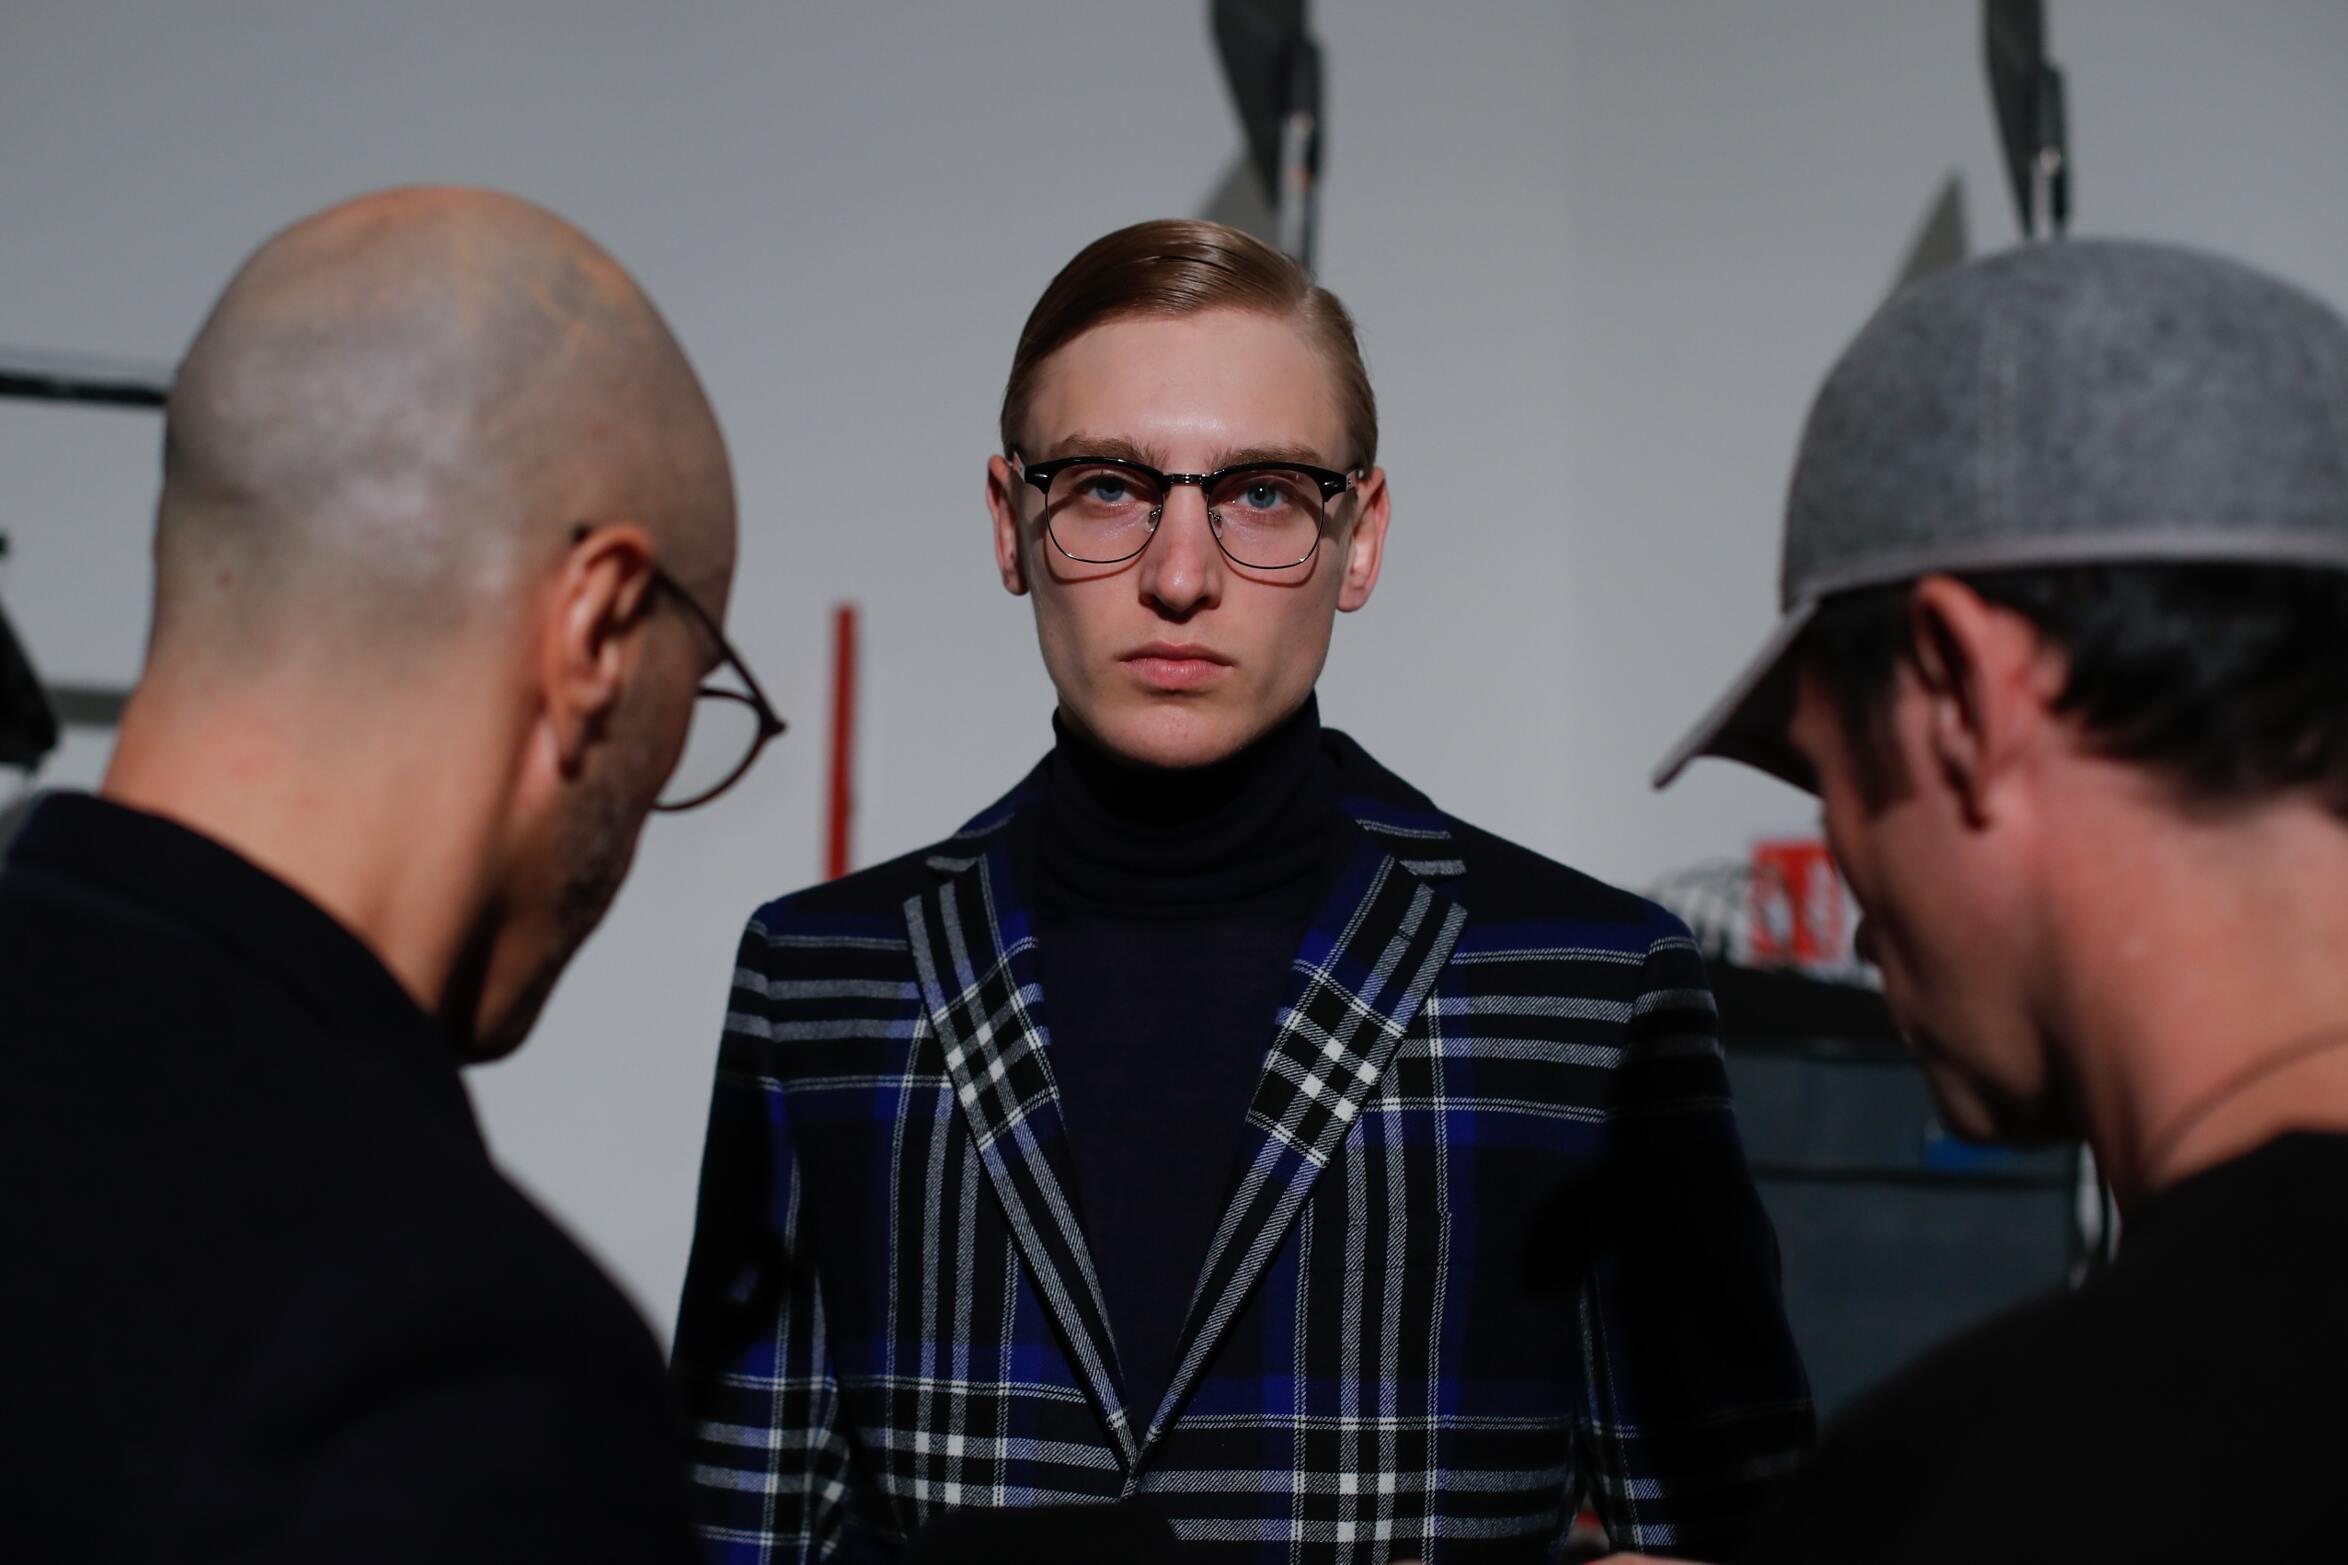 Daks Backstage Man Model